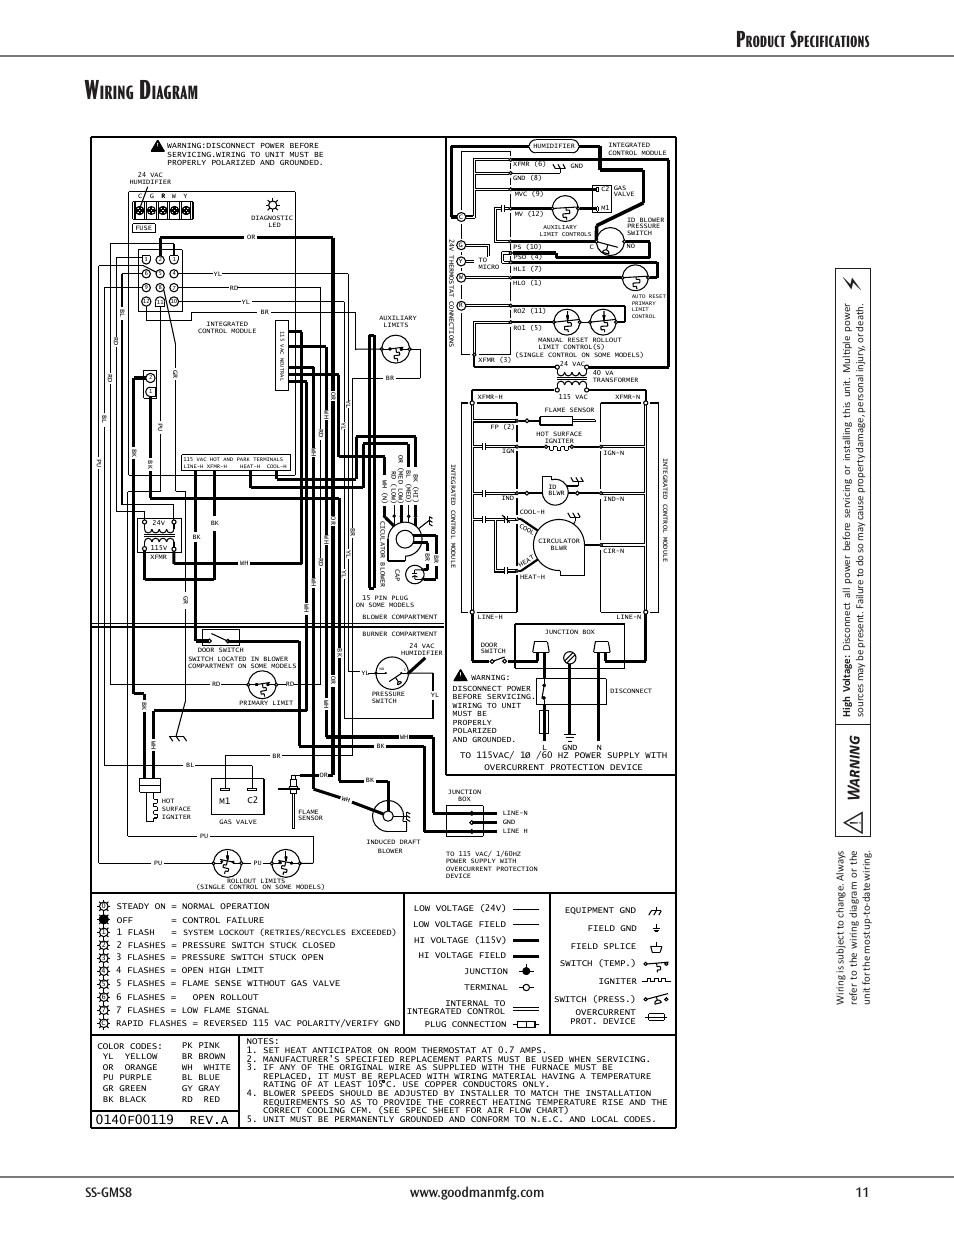 DX_5714] Goodman Air Handler Wiring Diagrams File Name Allmodels Goodman  Air Wiring DiagramBedr Nful Gho Vira Mohammedshrine Librar Wiring 101